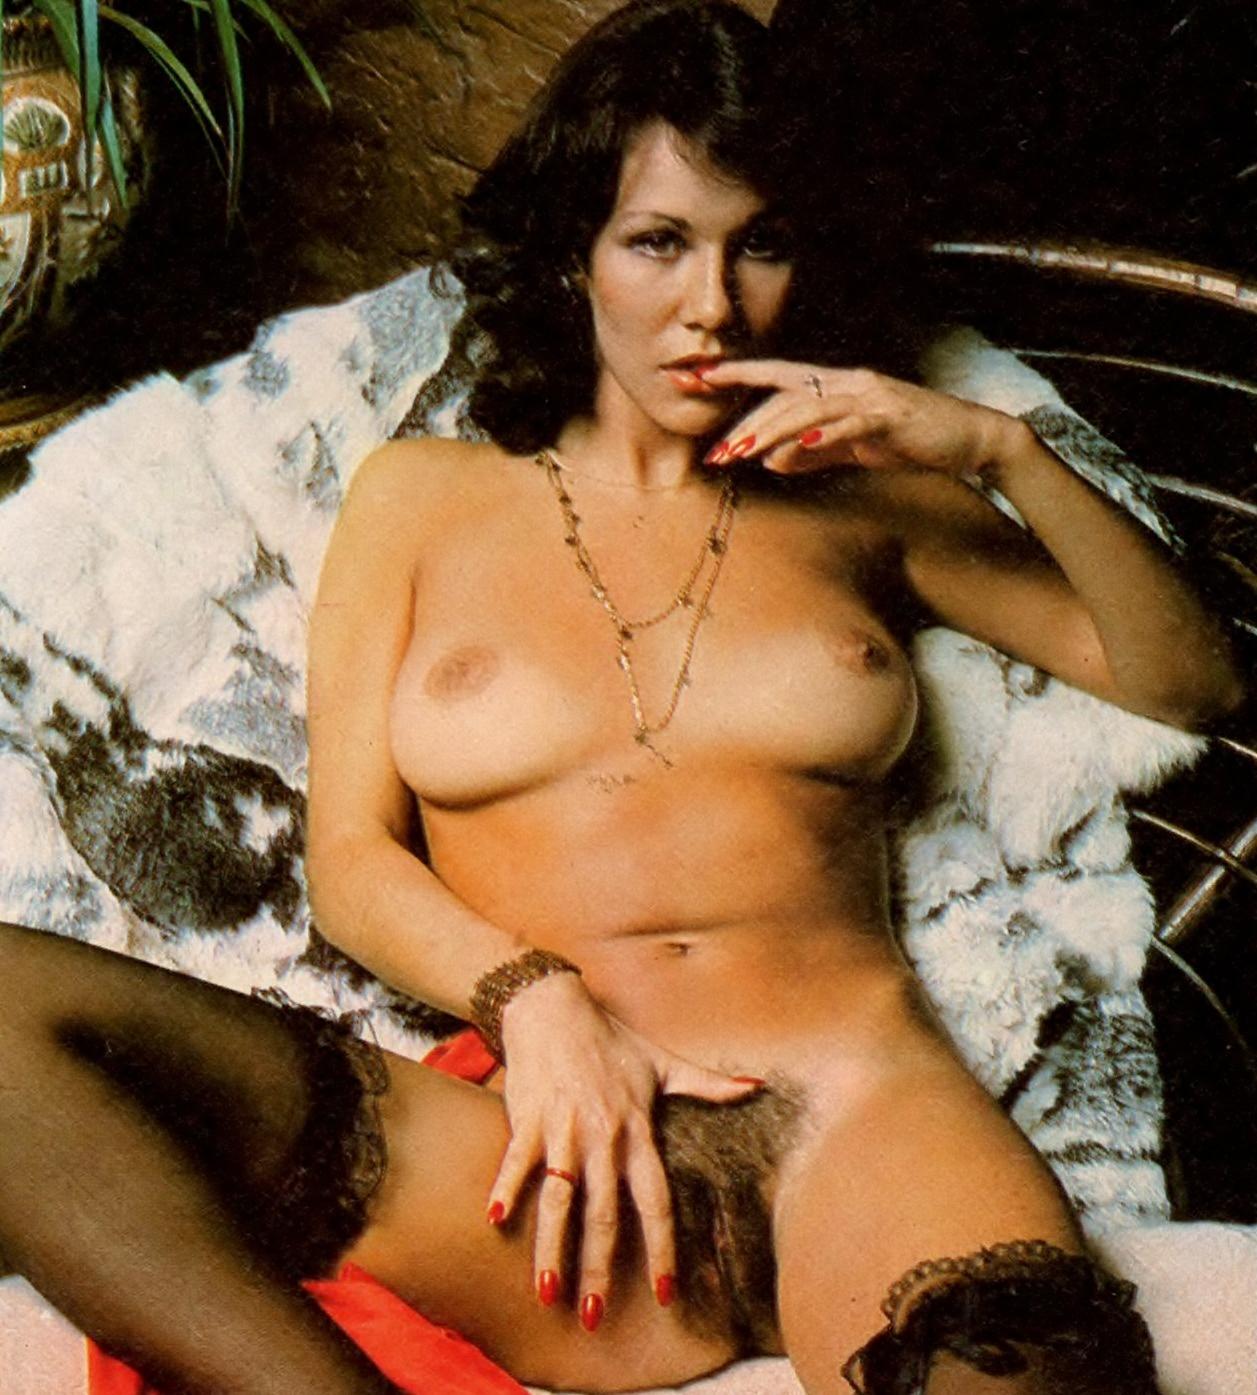 Linda guerra hot pussy — photo 13